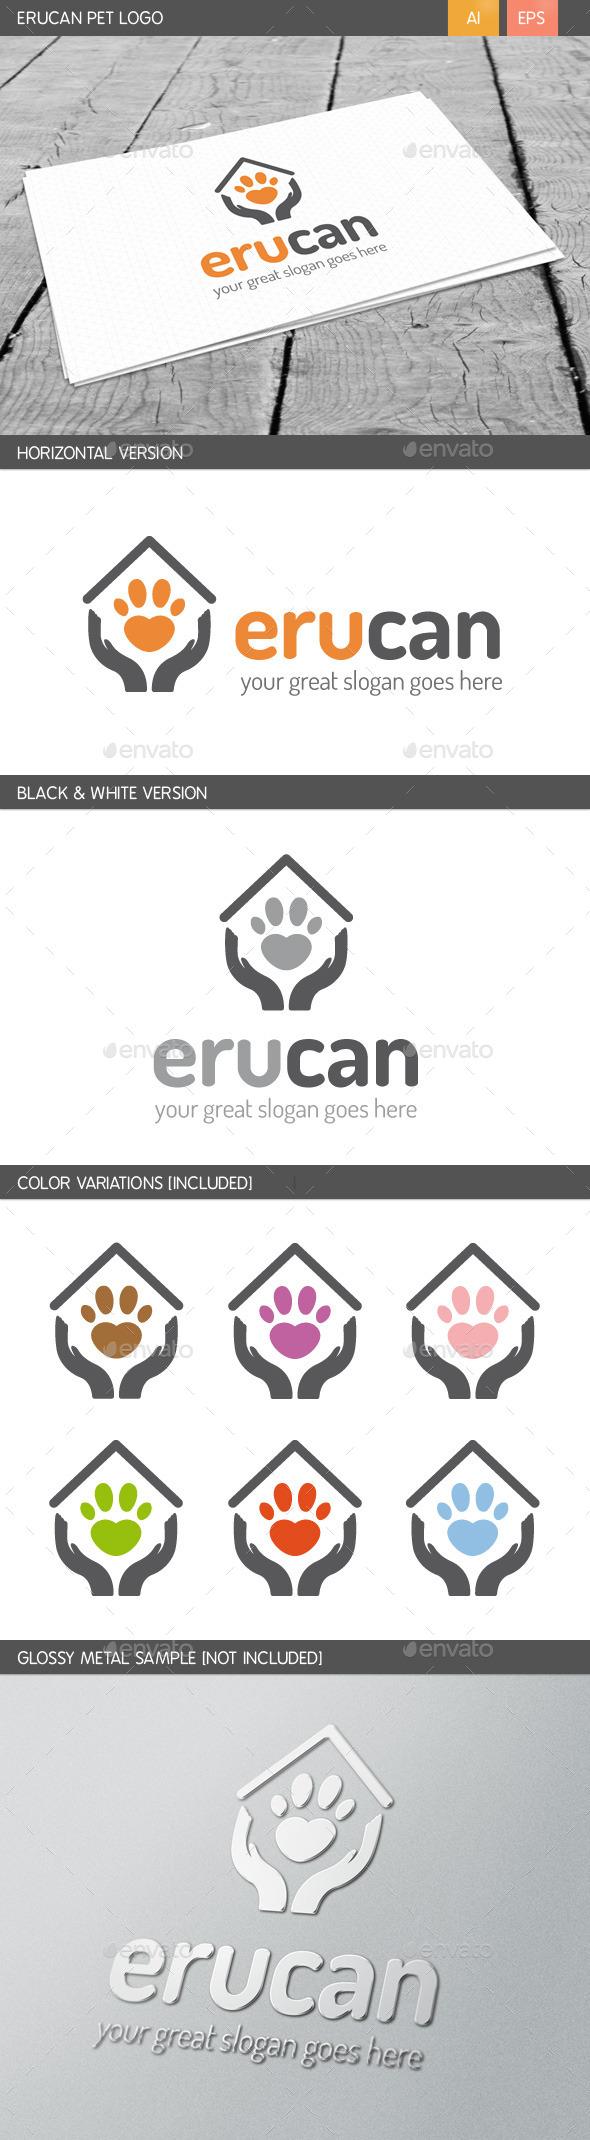 GraphicRiver Erucan Pet Logo 10658065